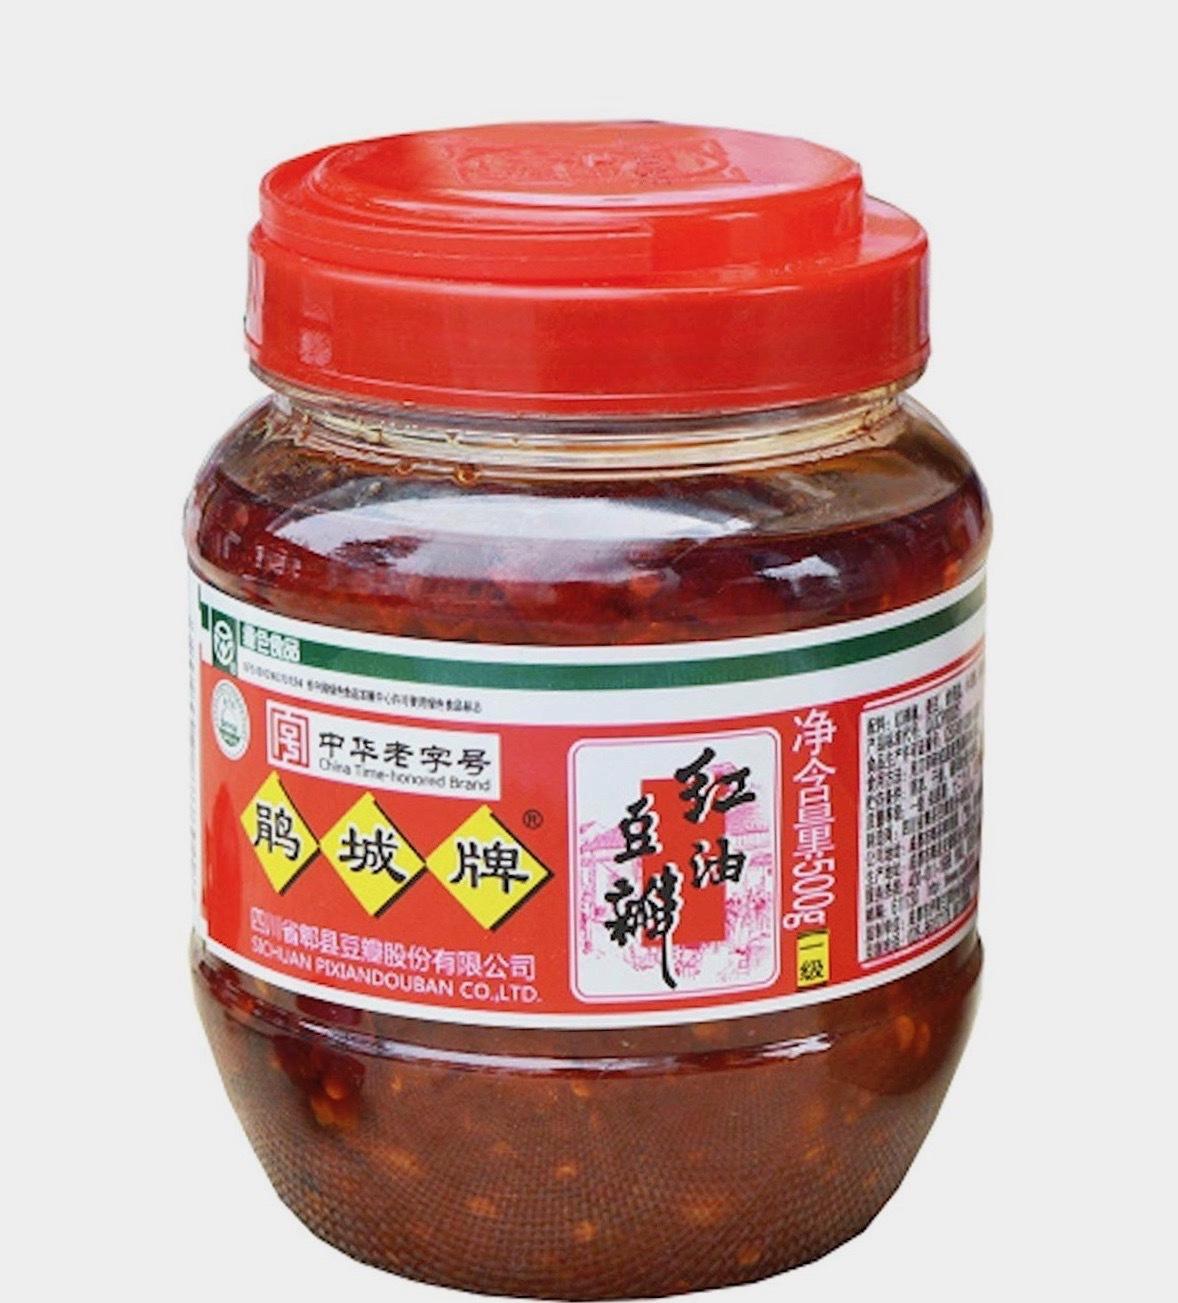 Pâte pimentée